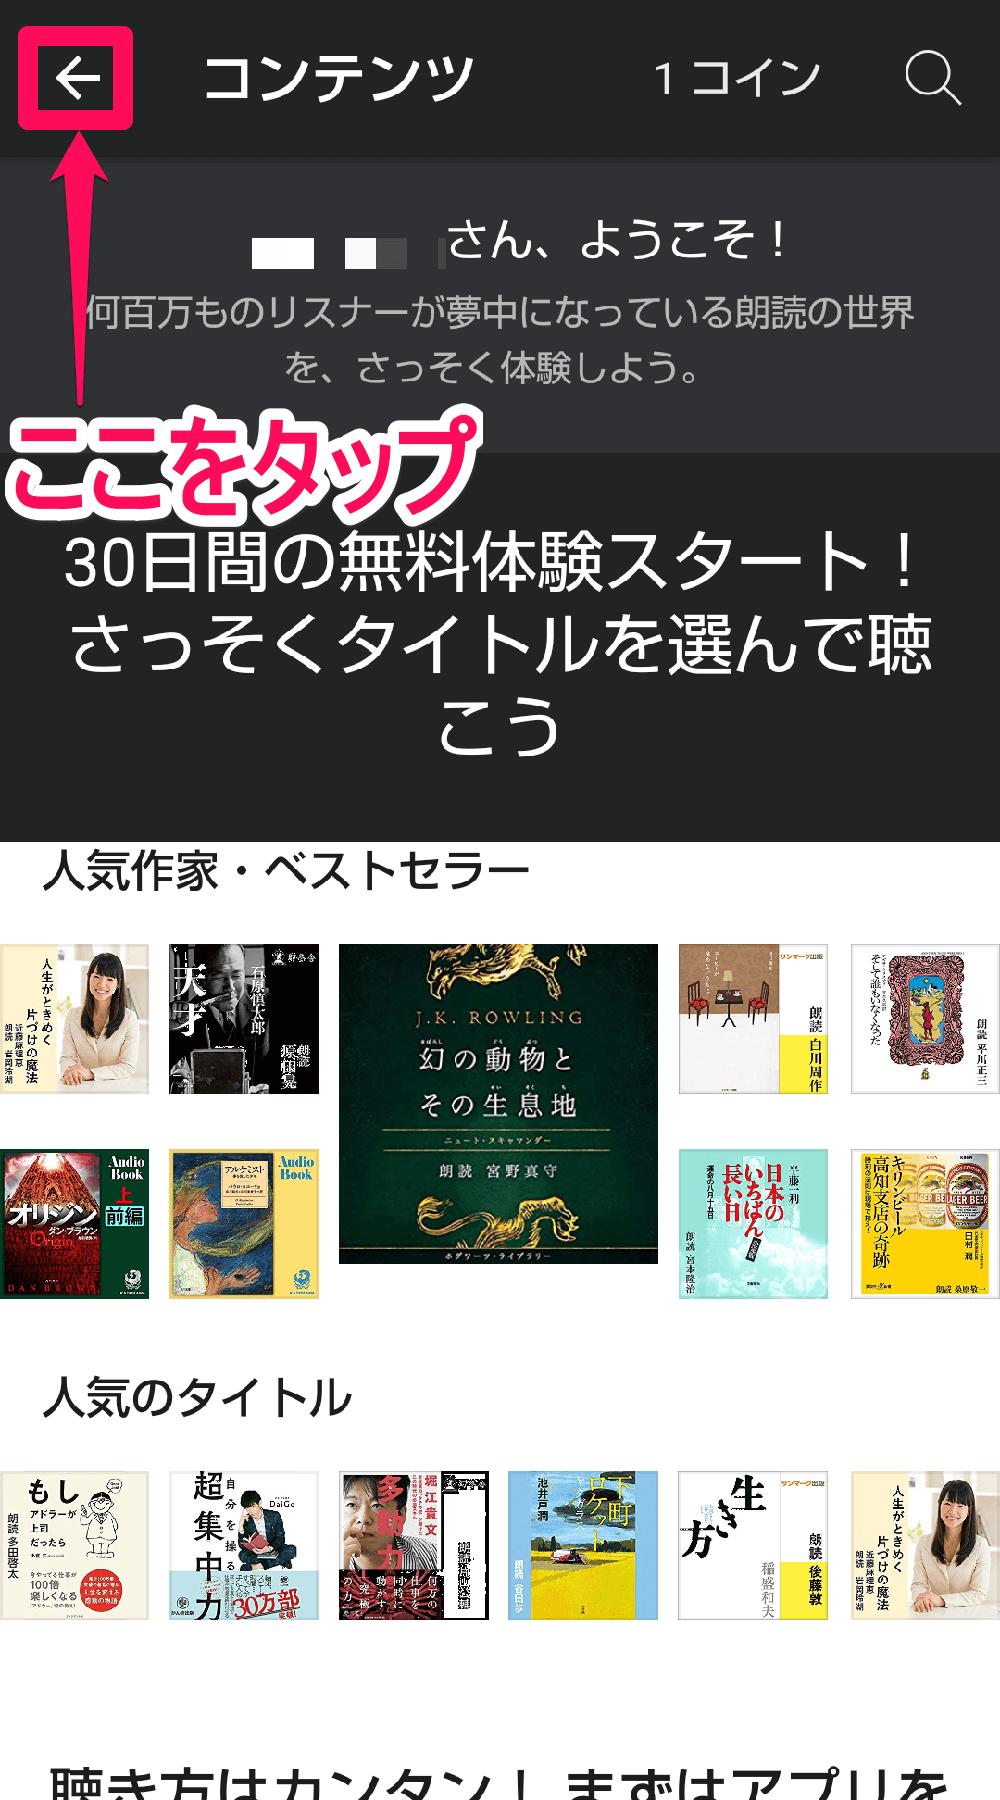 Audibleアプリ(オーディブルアプリ)の[コンテンツ]→「〇〇さん、ようこそ!」画面